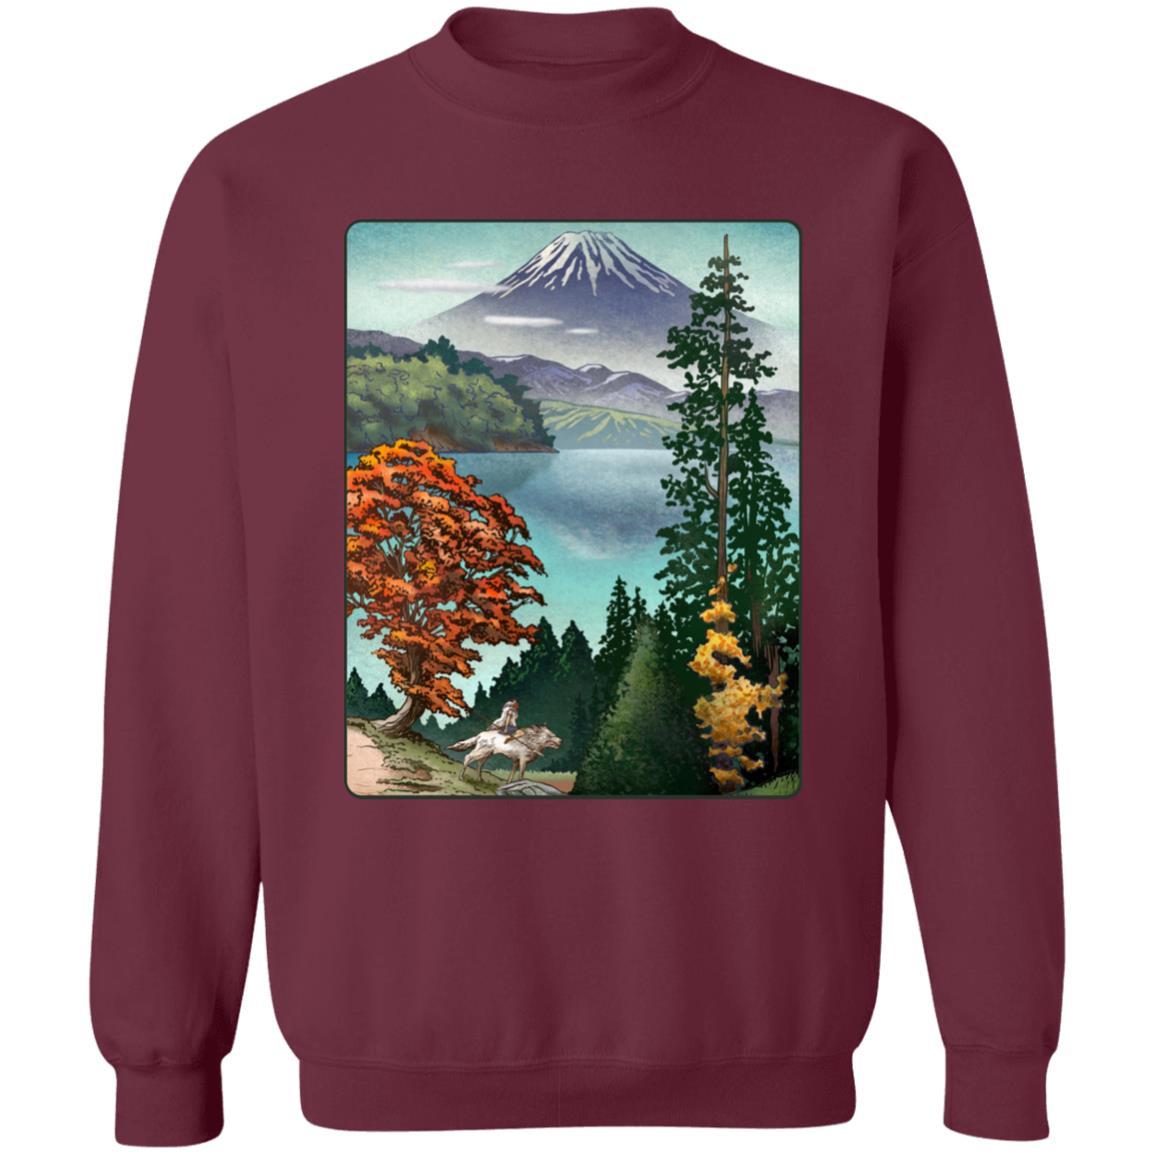 Princess Mononoke Landscape Sweatshirt